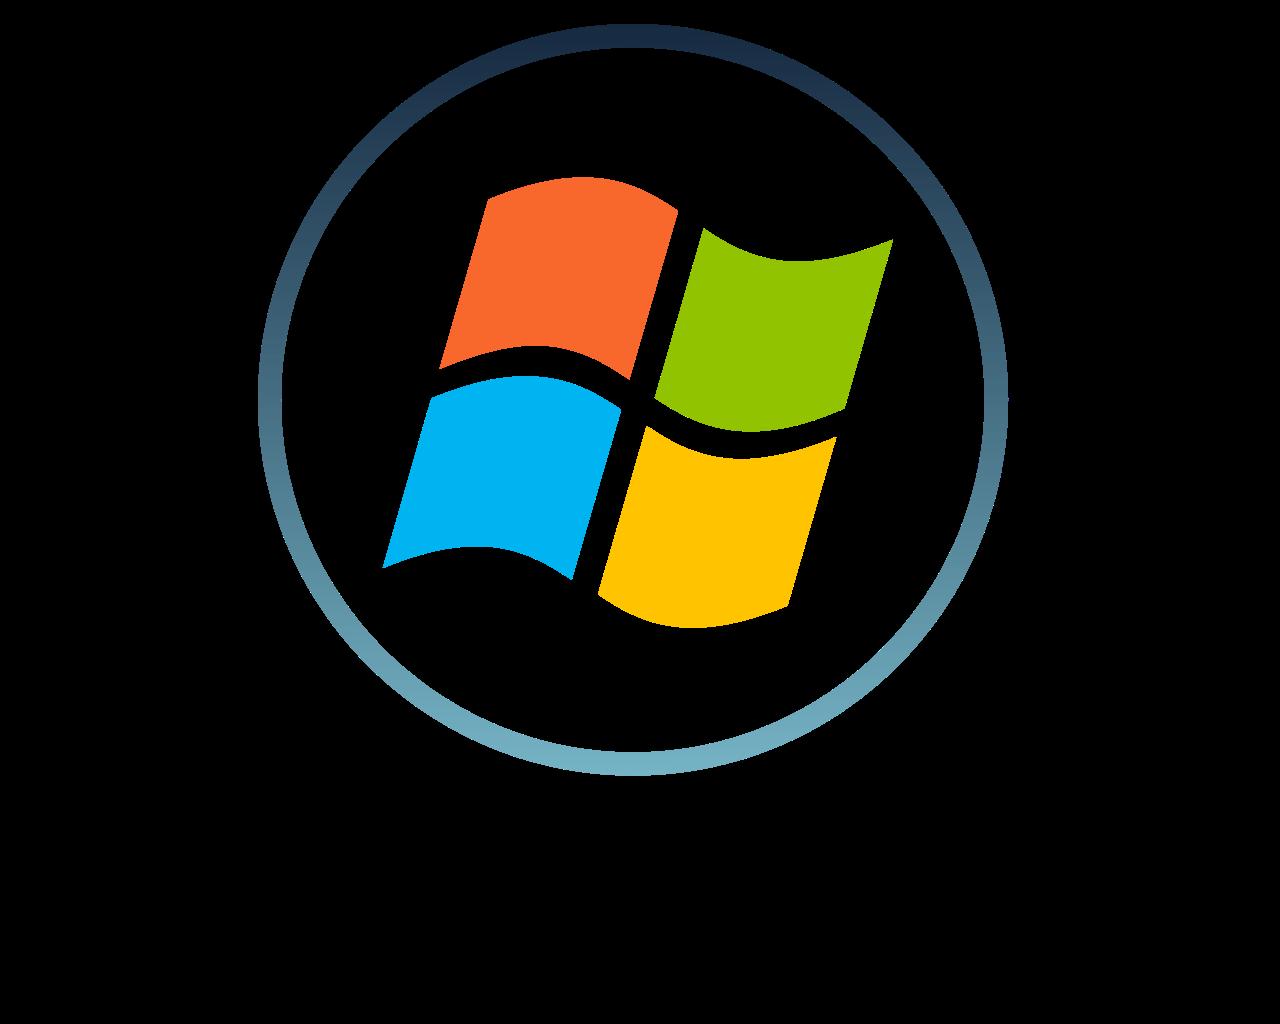 File:Windows Vista logo.svg.